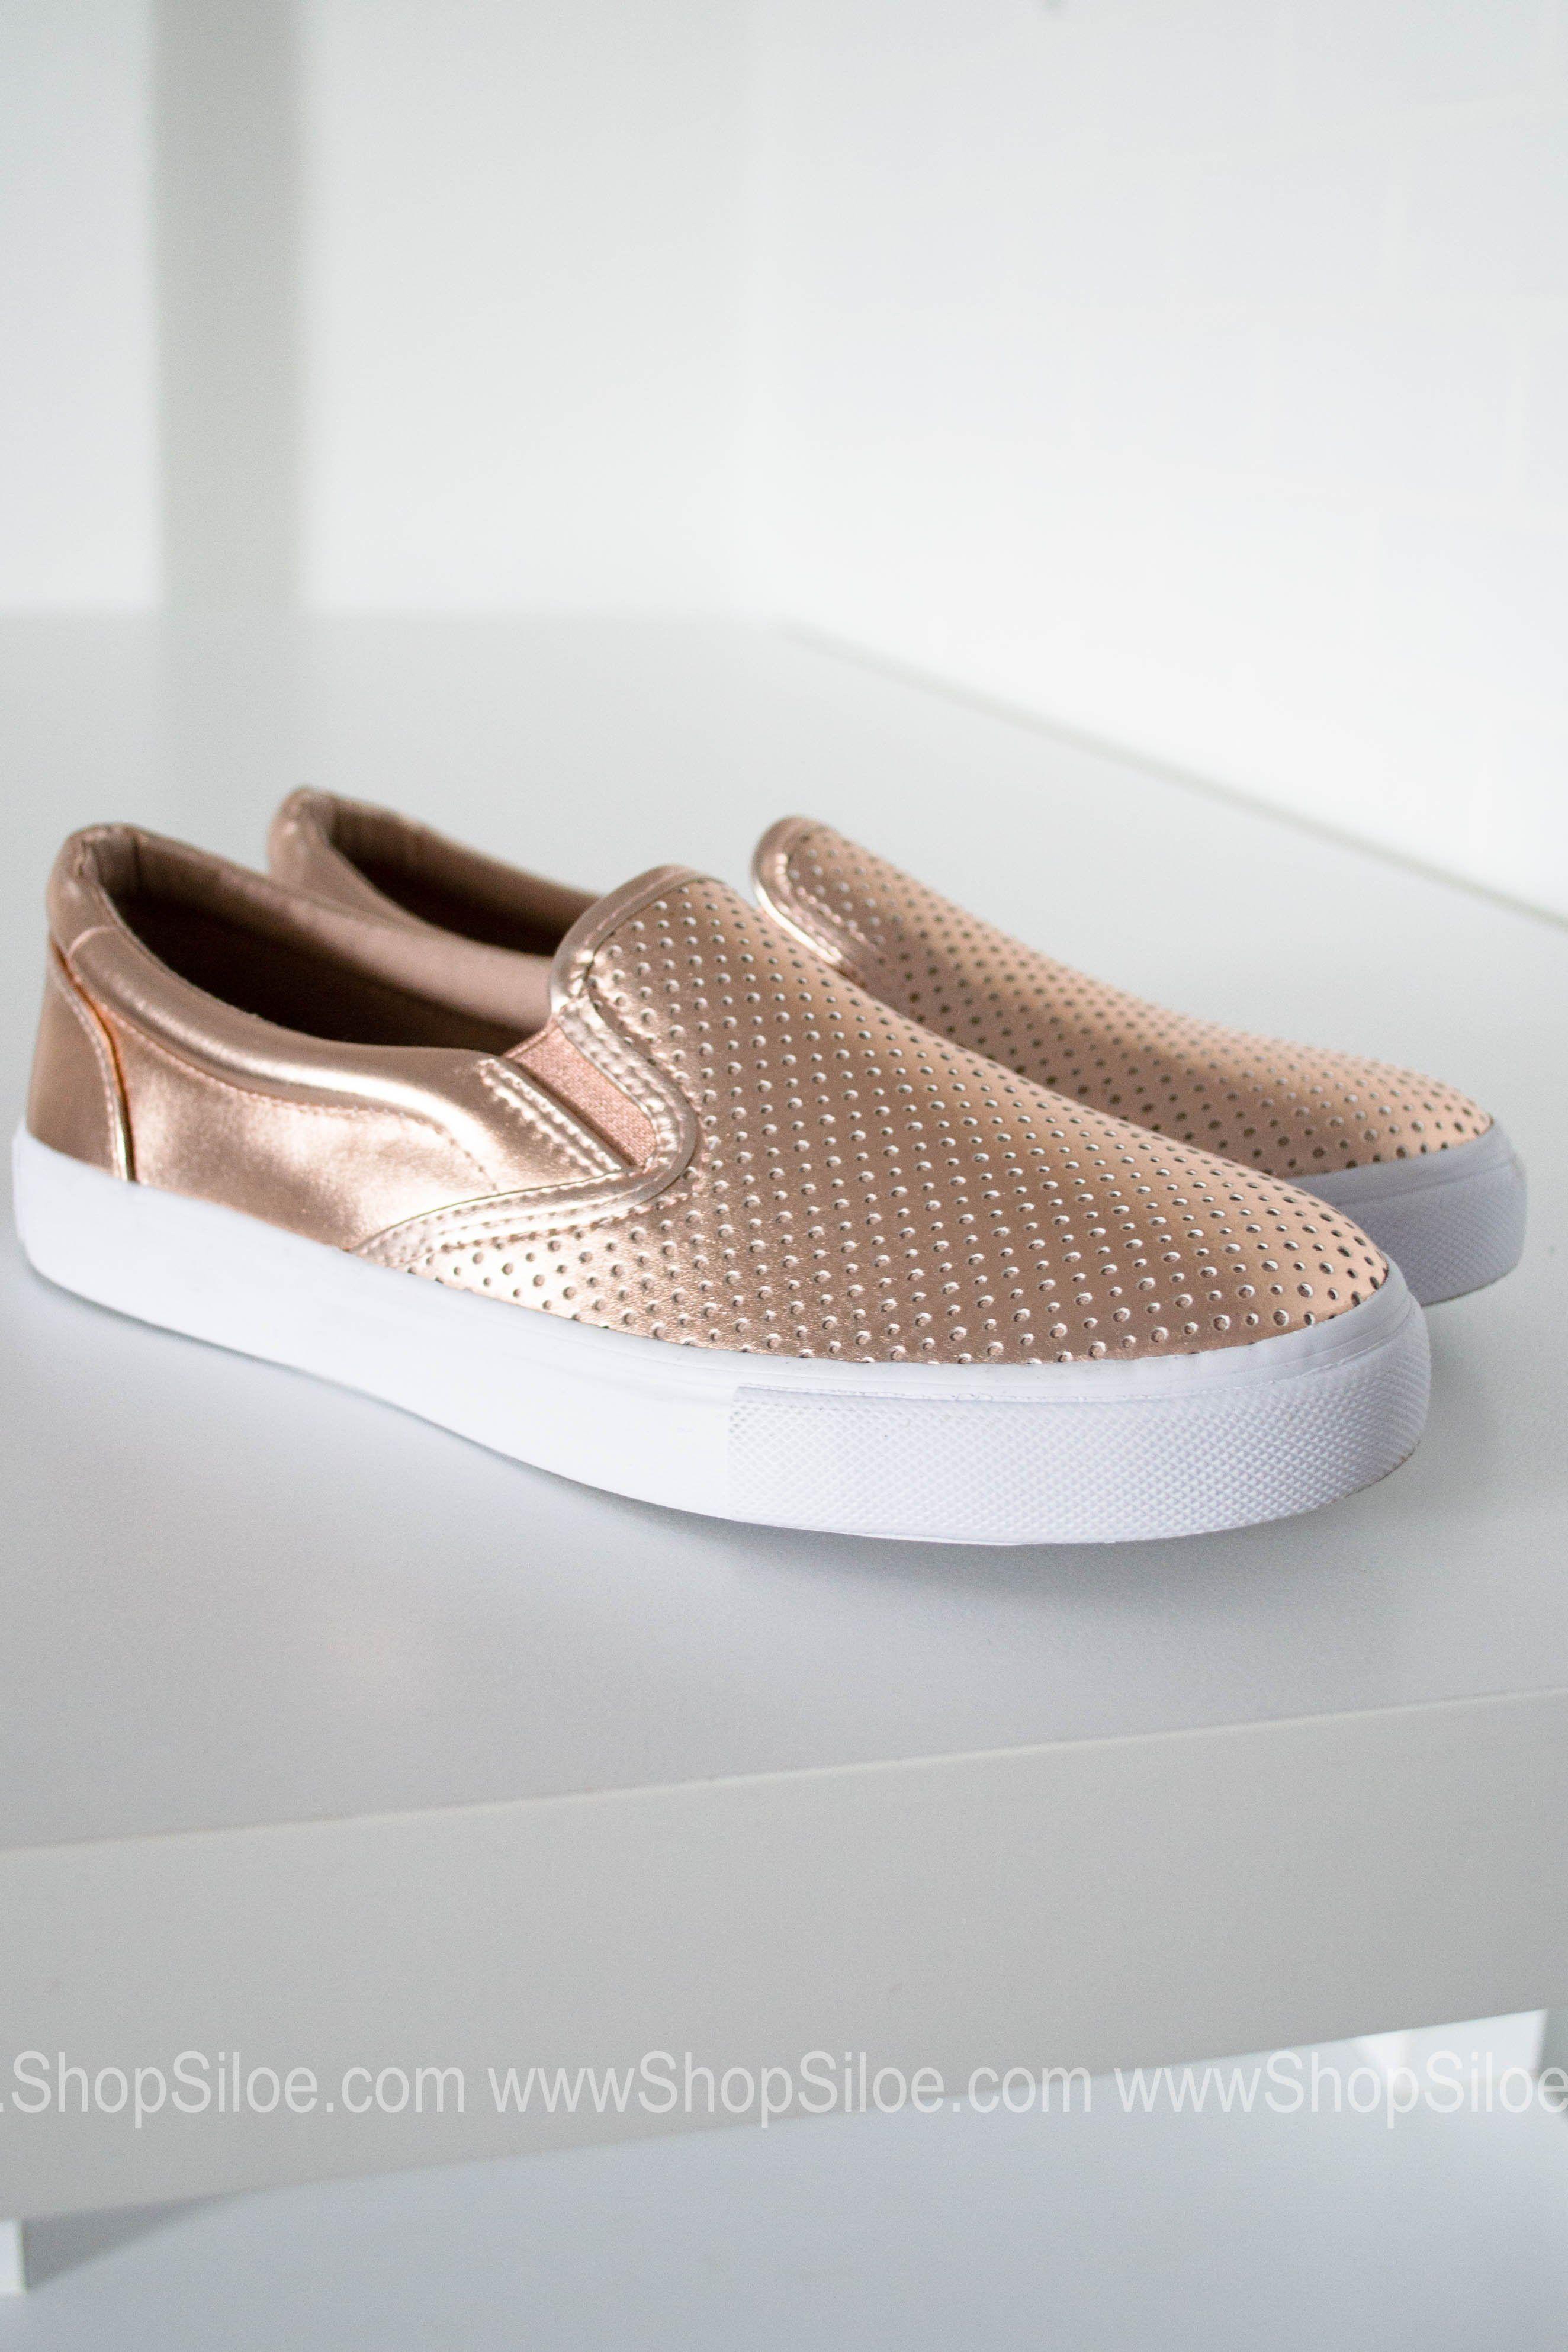 Rose Gold Metallic Slip On Shoes | Slip